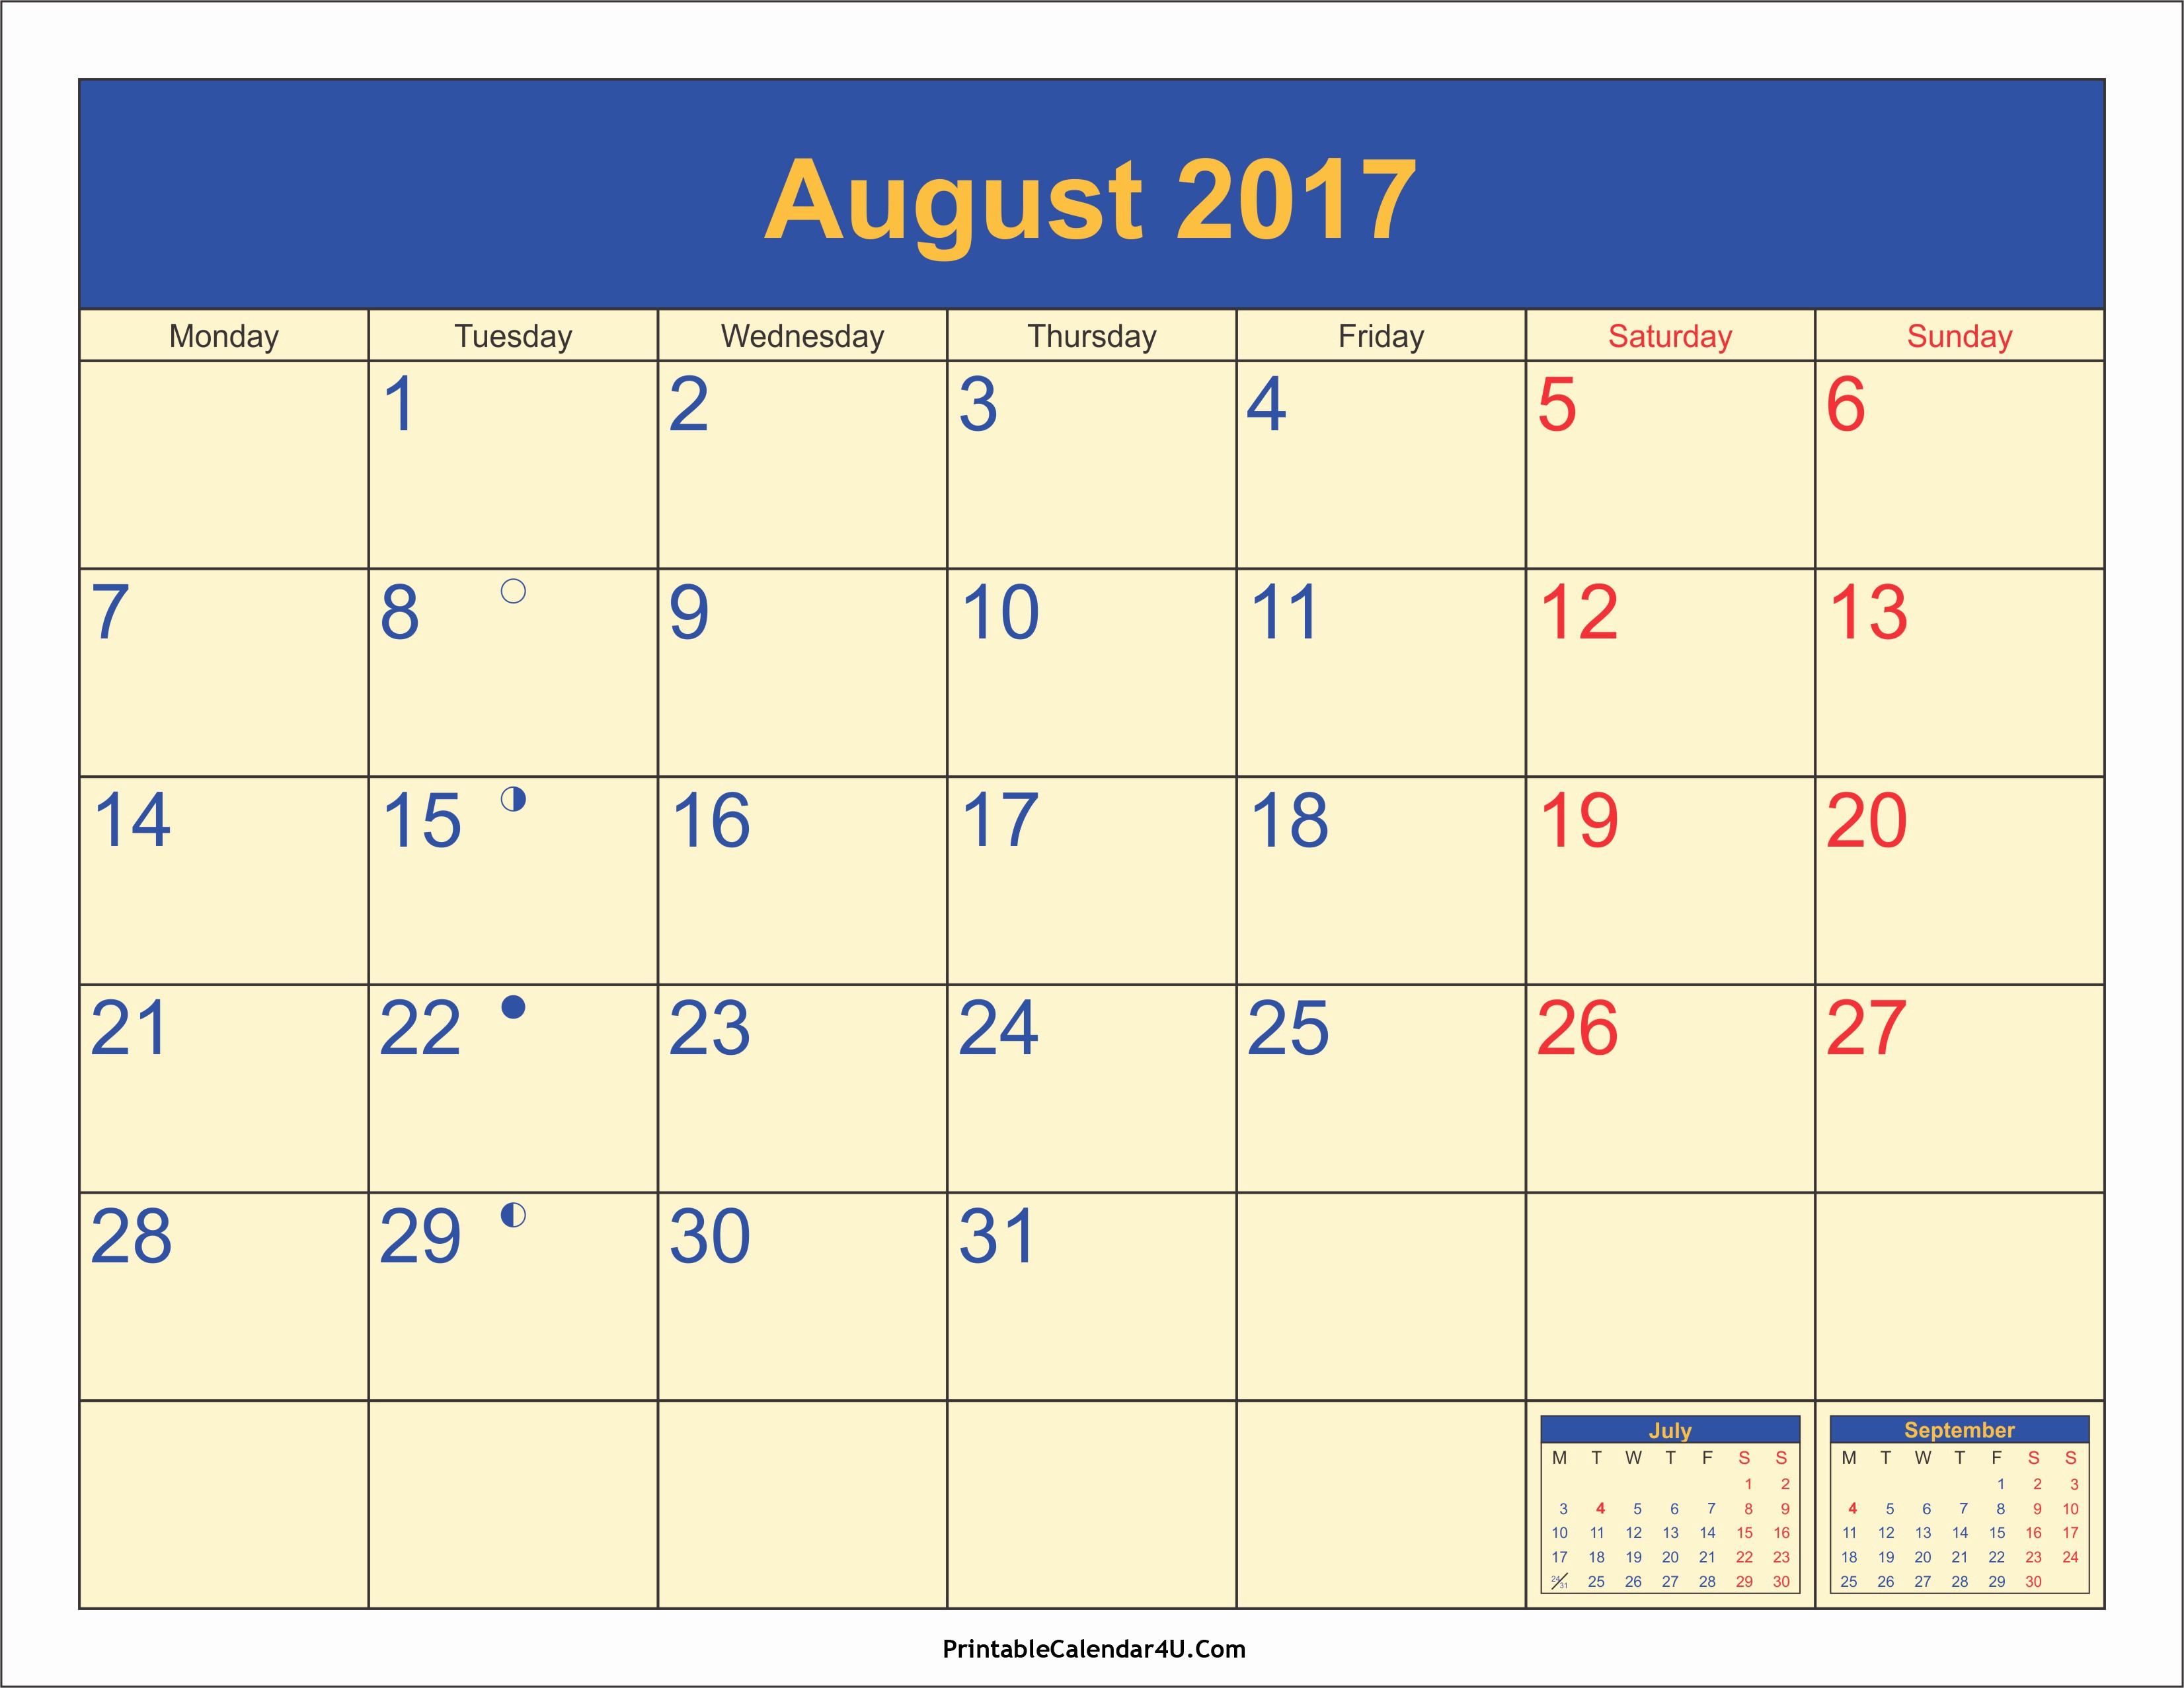 2017 Weekly Calendar with Holidays Lovely August 2017 Calendar Ca